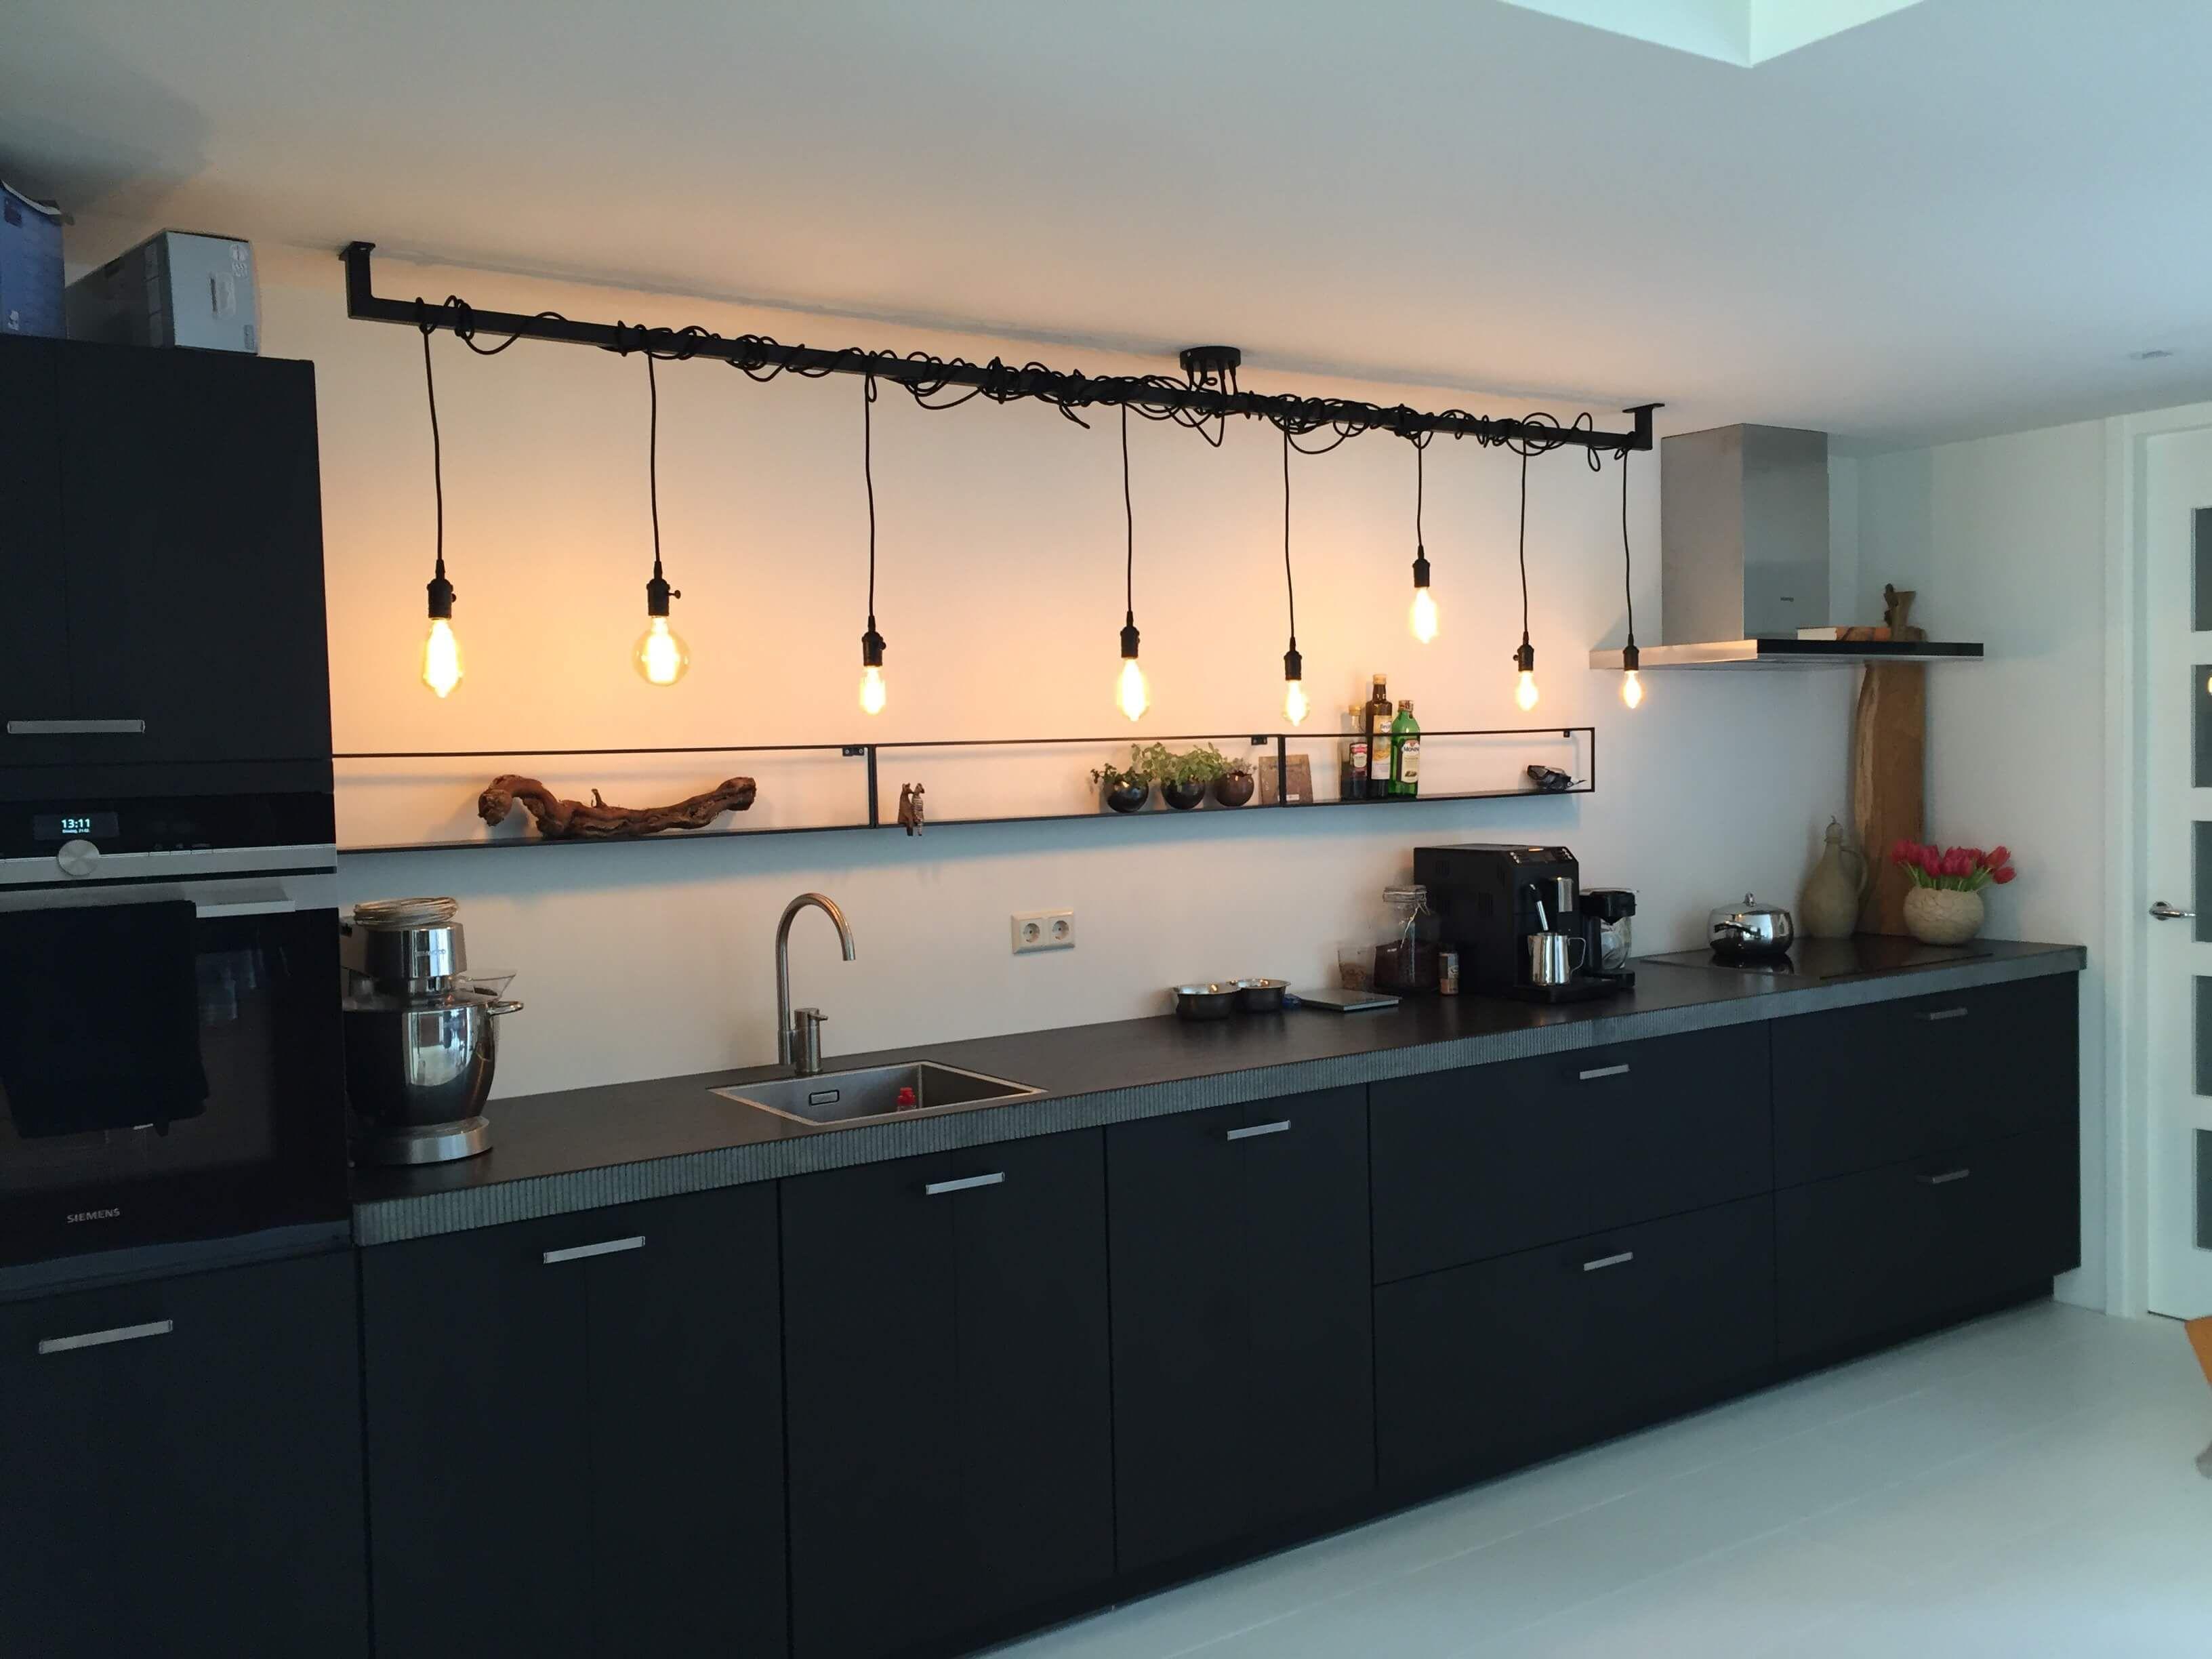 Industriële keuken of eettafel lamp kopen opvallend industrieel